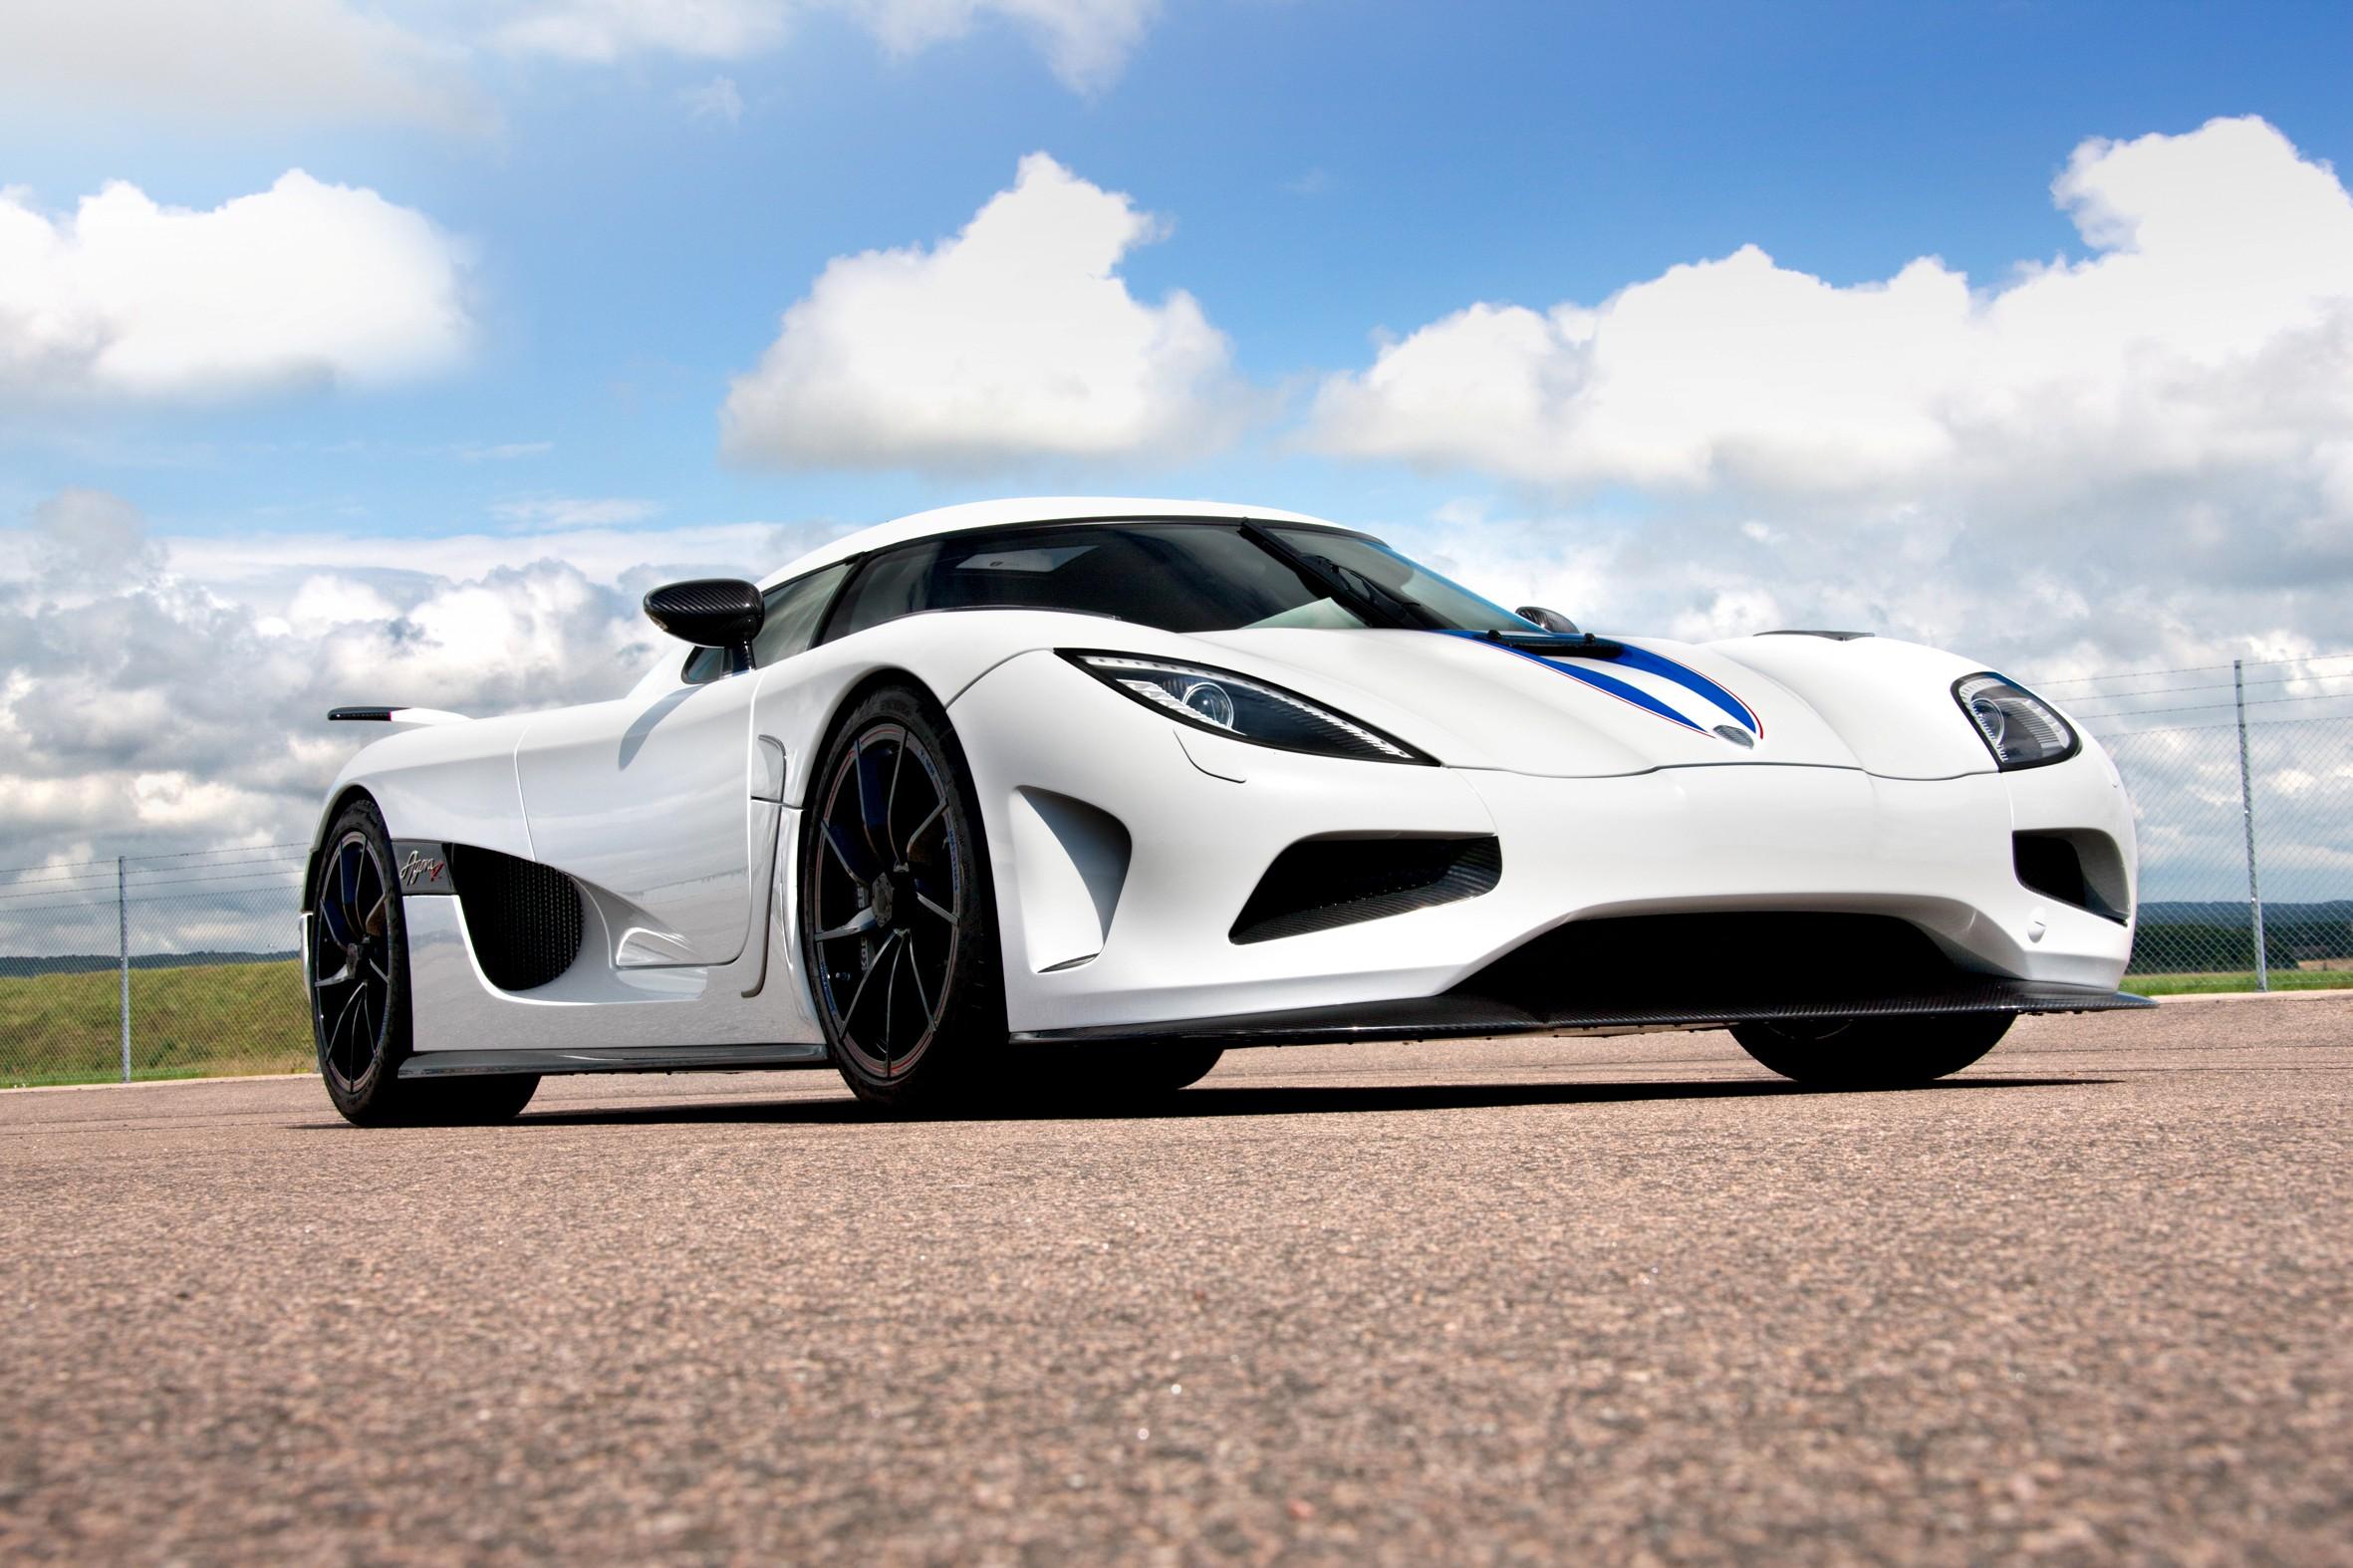 2013 Koenigsegg Agera R: Nanotech And Carbon Extravaganza